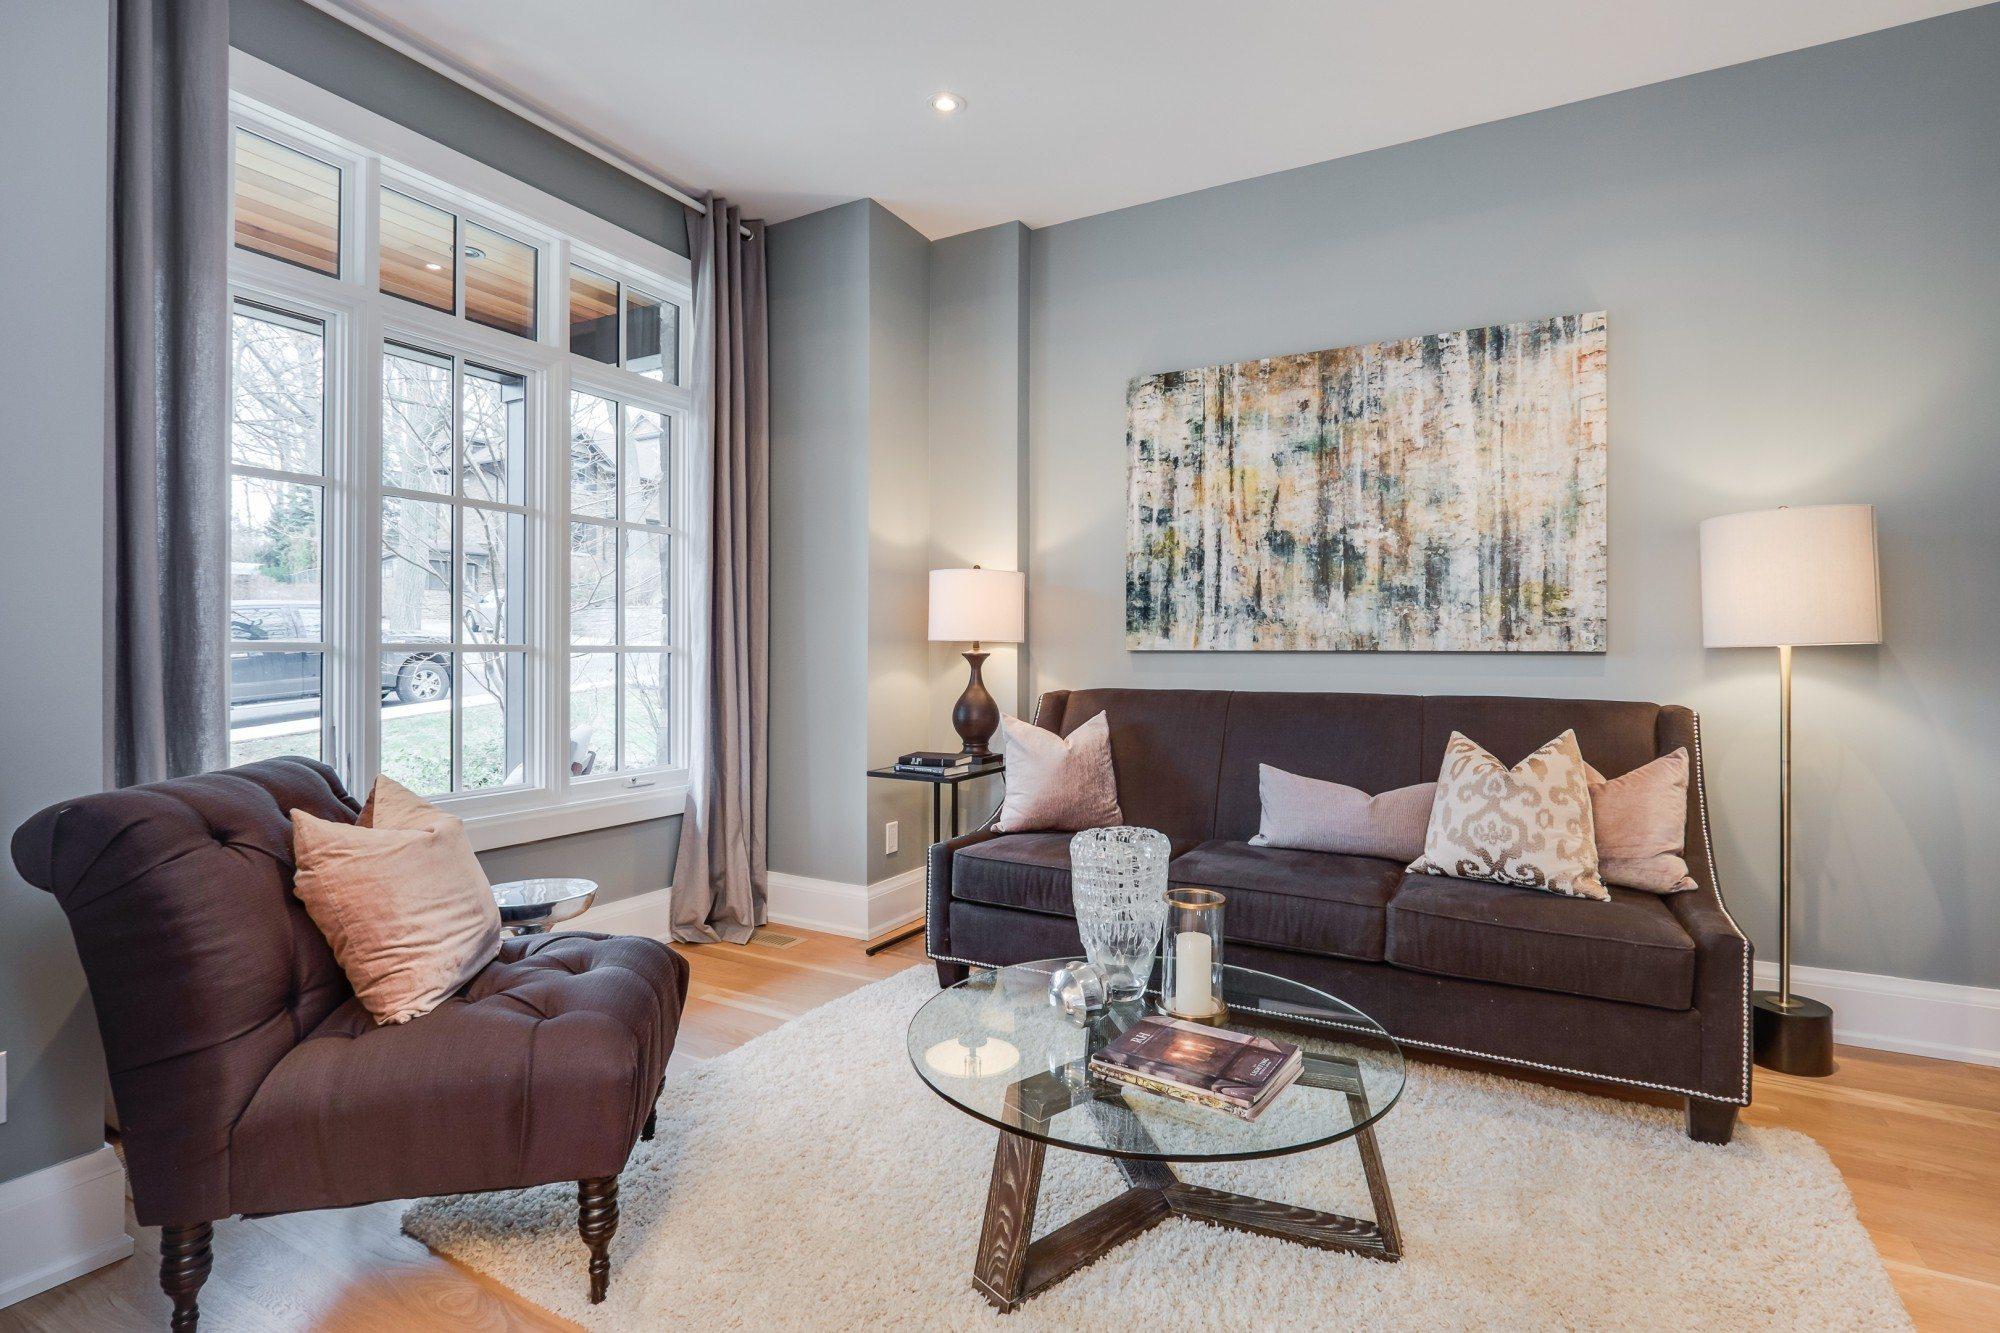 toronto-house-for-sale-105-pine-glen-road-3